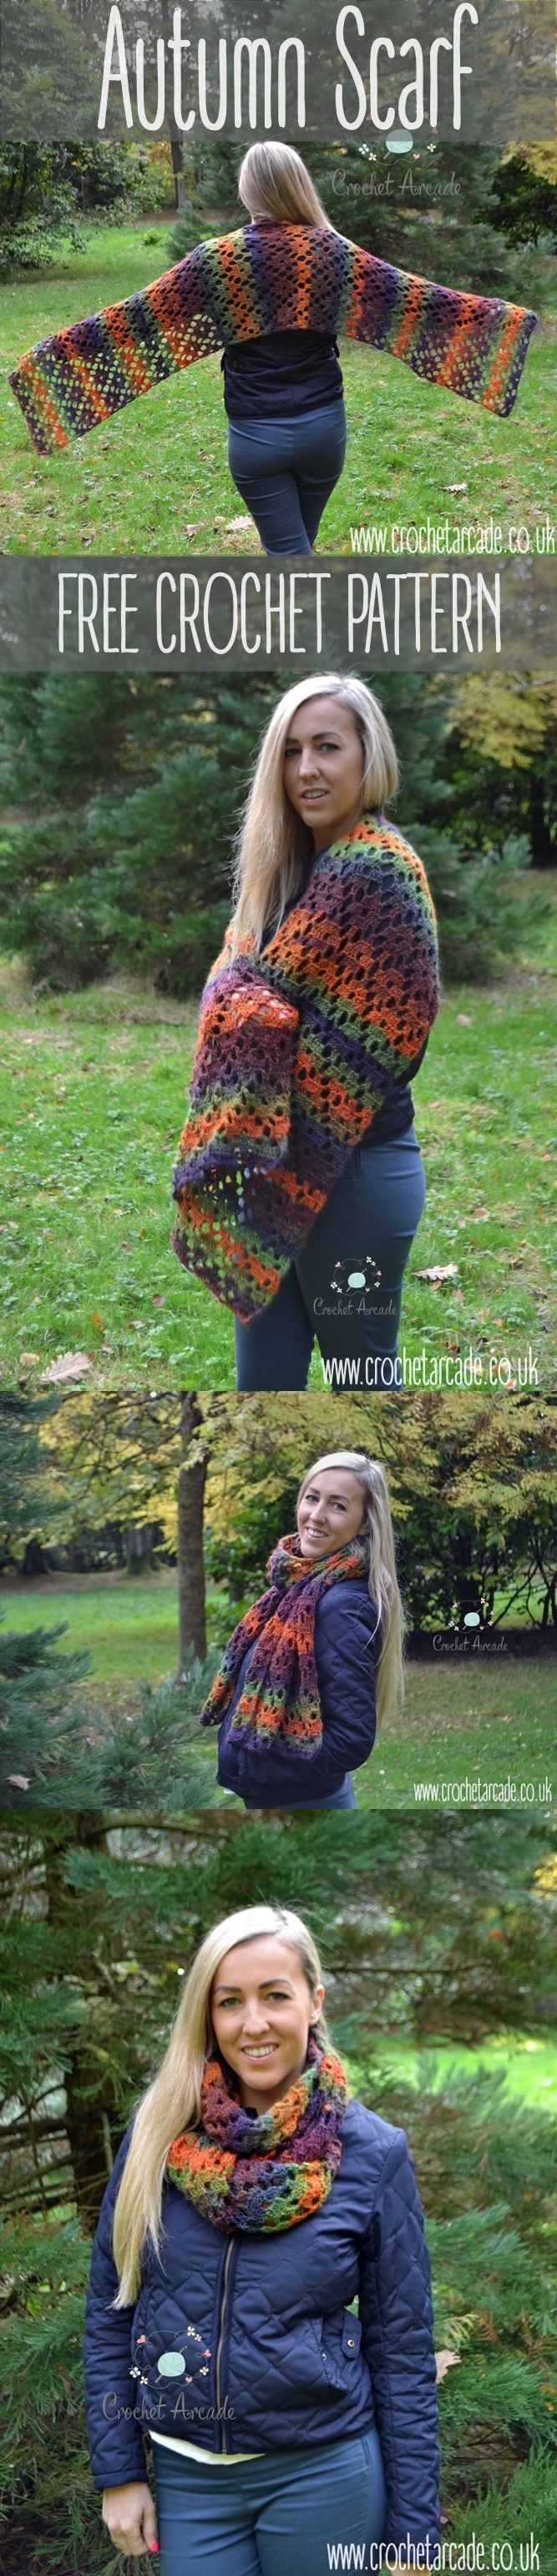 Autumn Scarf Free Crochet Pattern